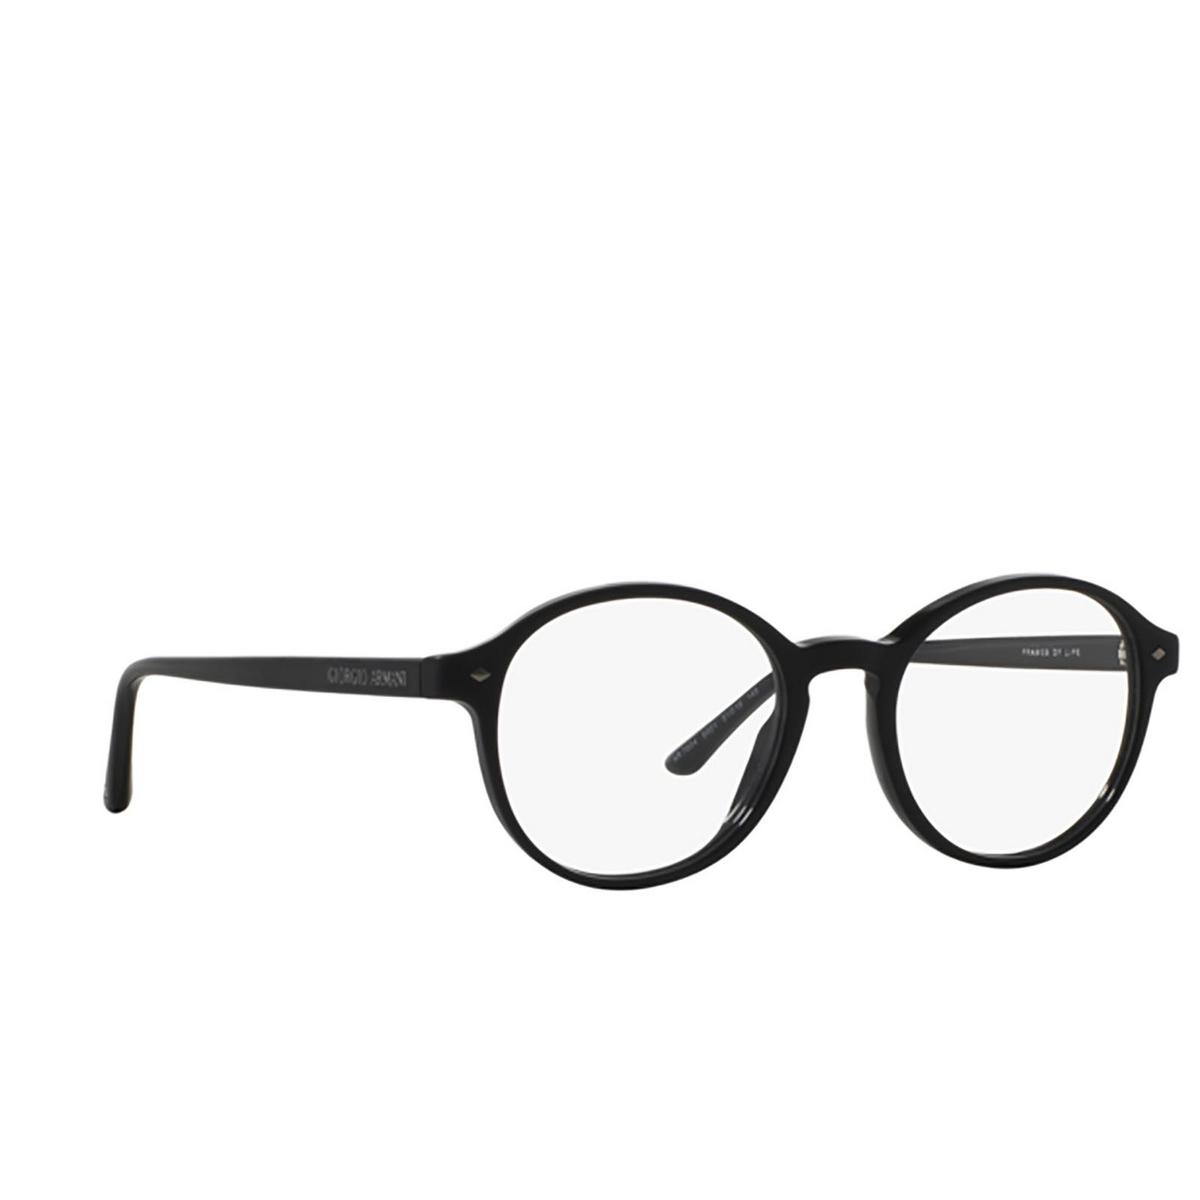 Giorgio Armani® Round Eyeglasses: AR7004 color Top Matte Black / Shiny 5001 - three-quarters view.